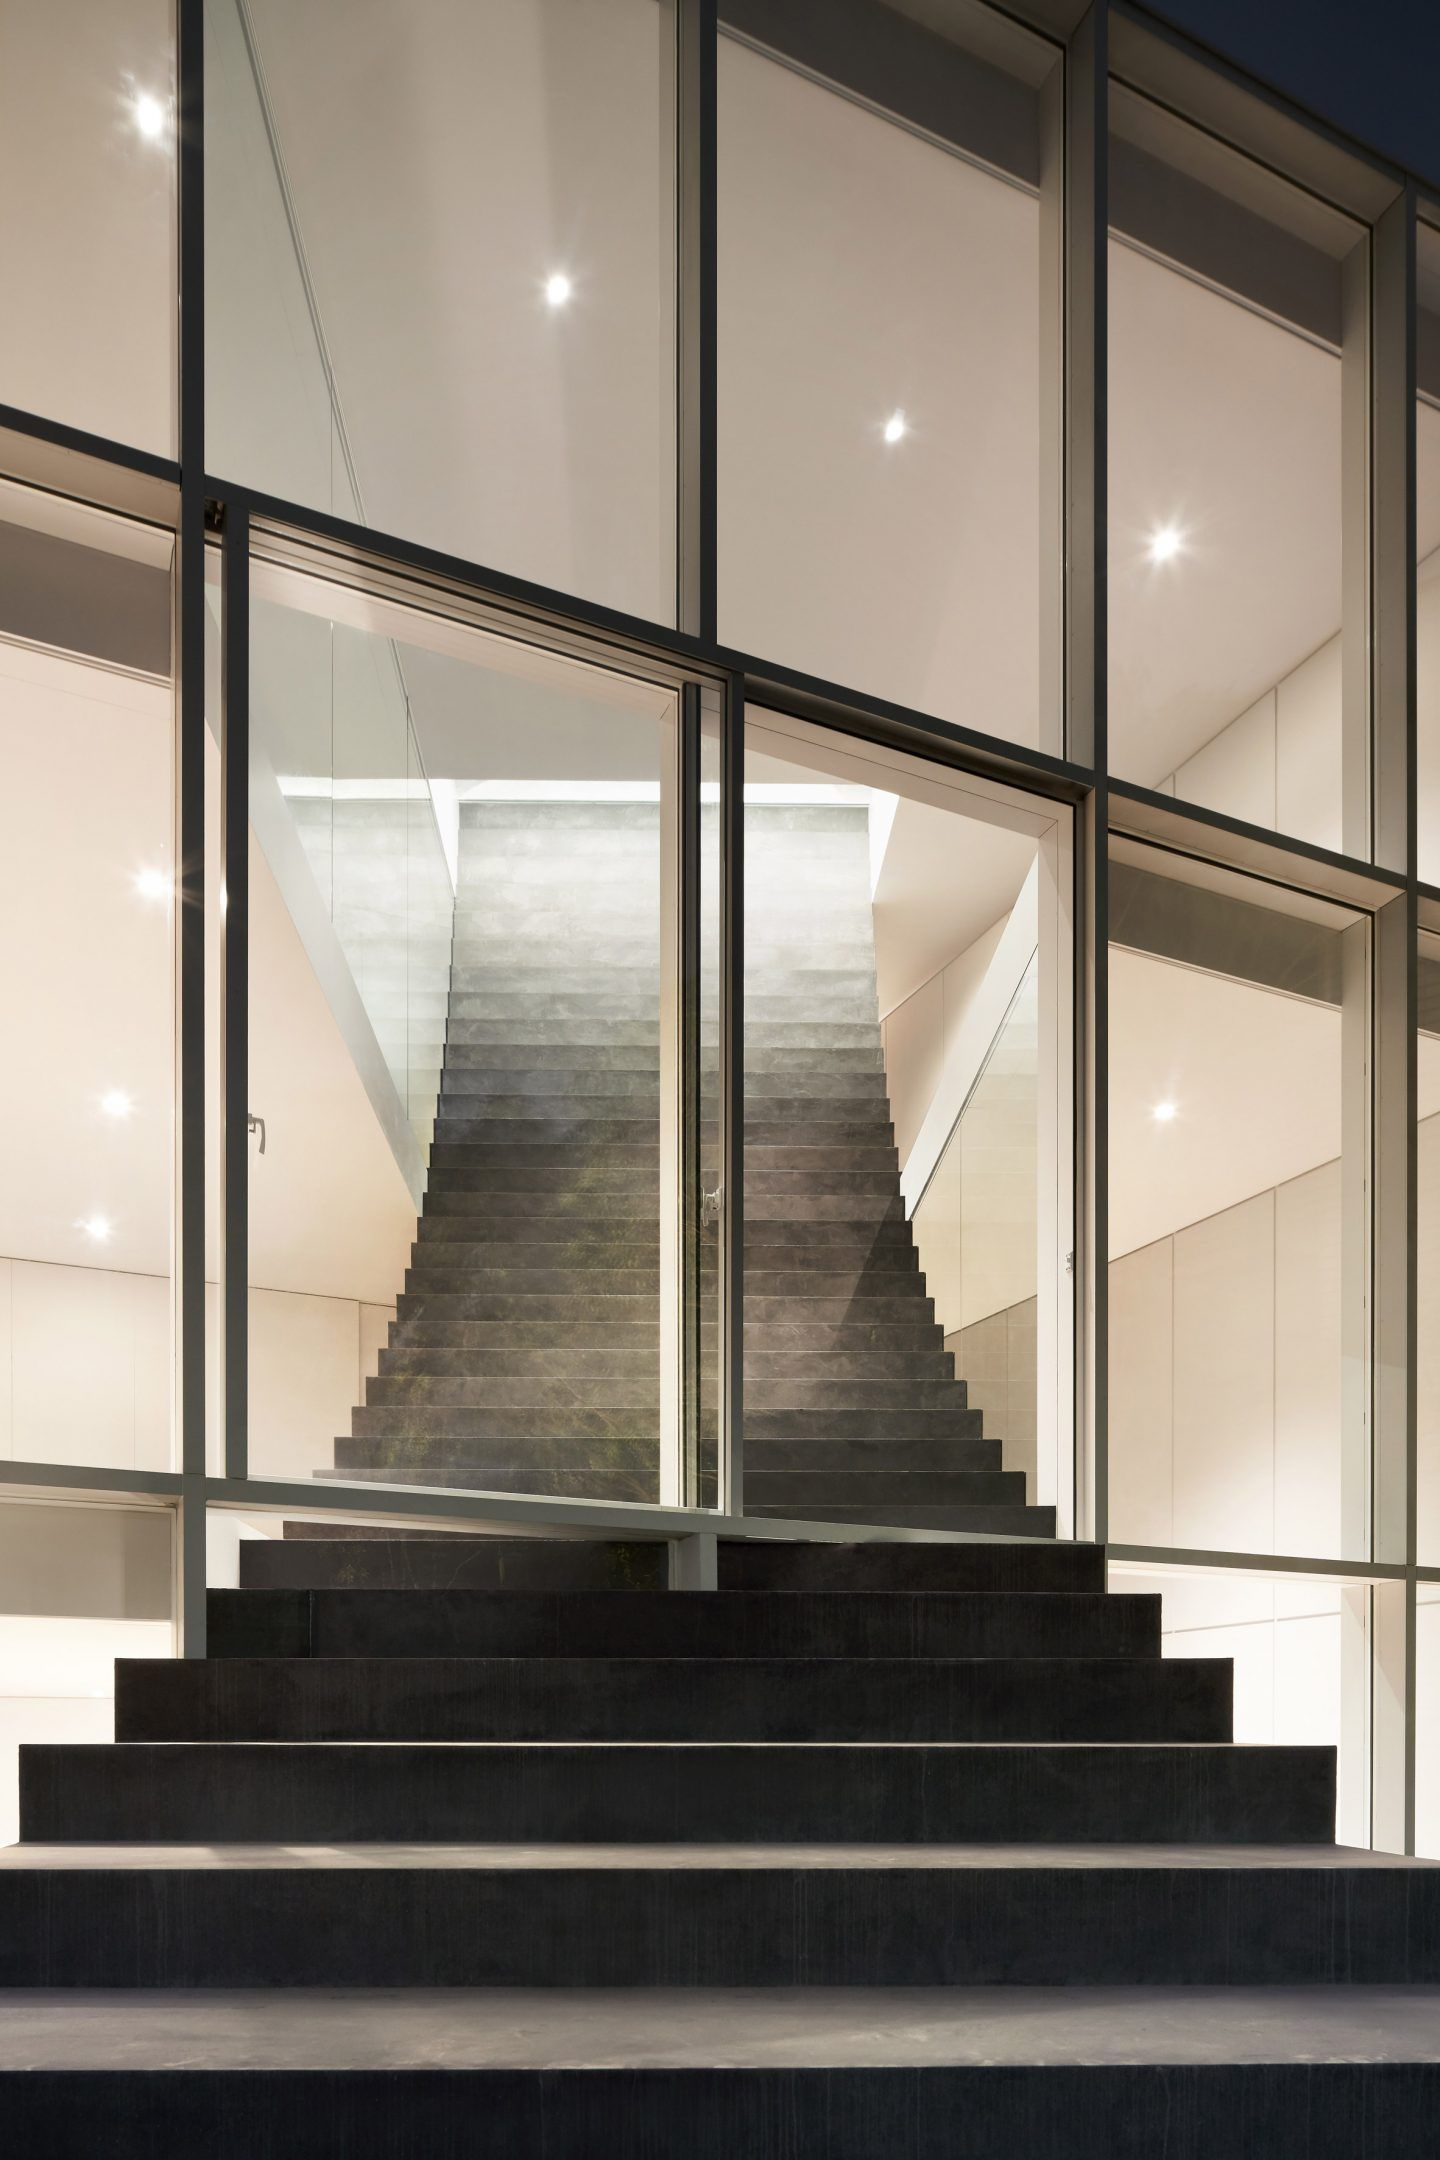 IGNANT-Architecture-Nendo-Stairway-House-012